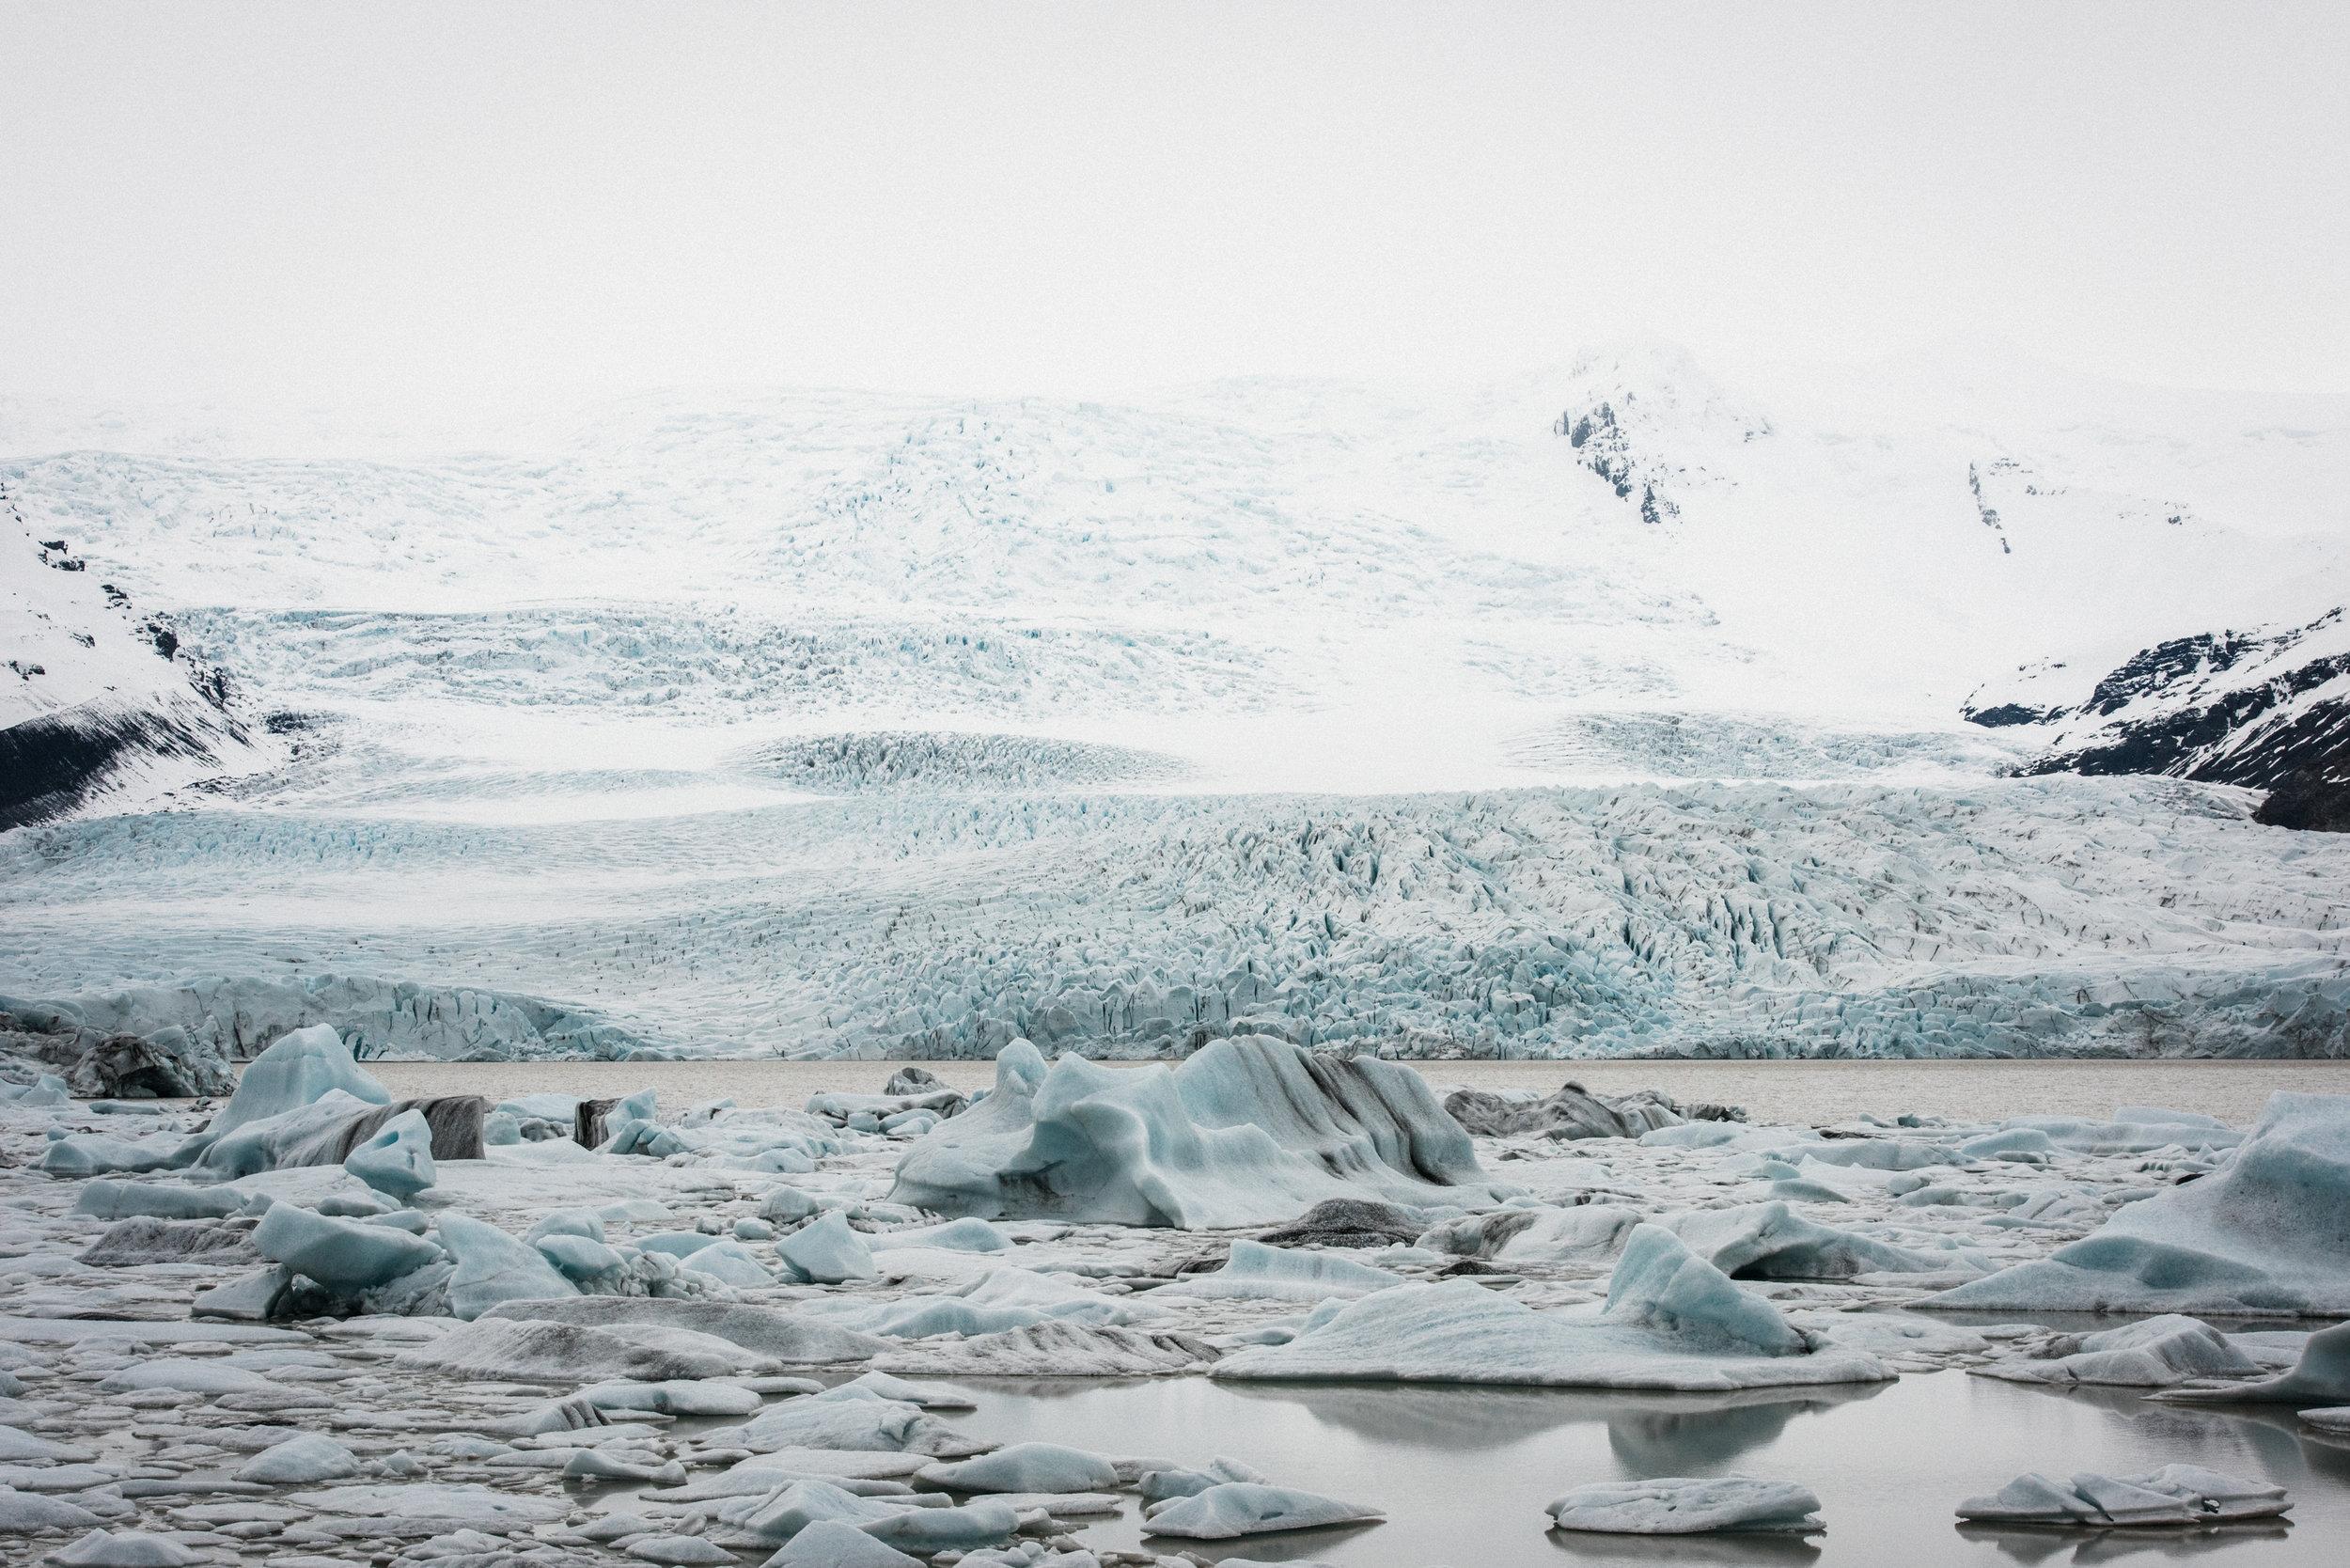 ICELAND_WOMAN_PHOTOGRAPHER_TARASHUPE_OUTDOOR_PHOTOGRAPHY_065.jpg